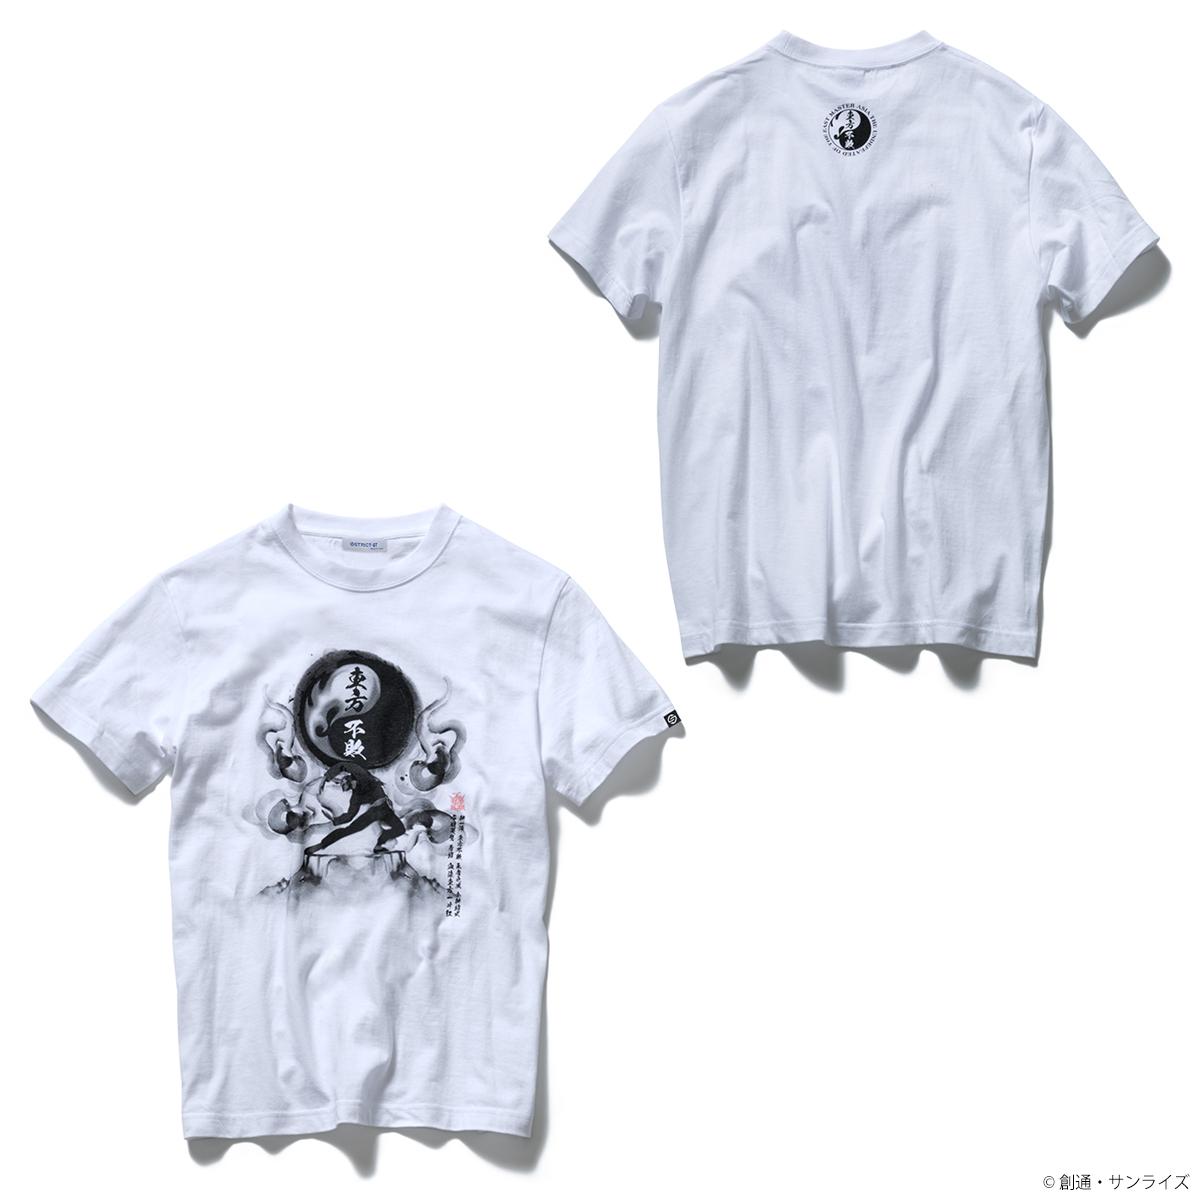 STRICT-G『機動武闘伝Gガンダム』 Tシャツ 東方不敗水墨画